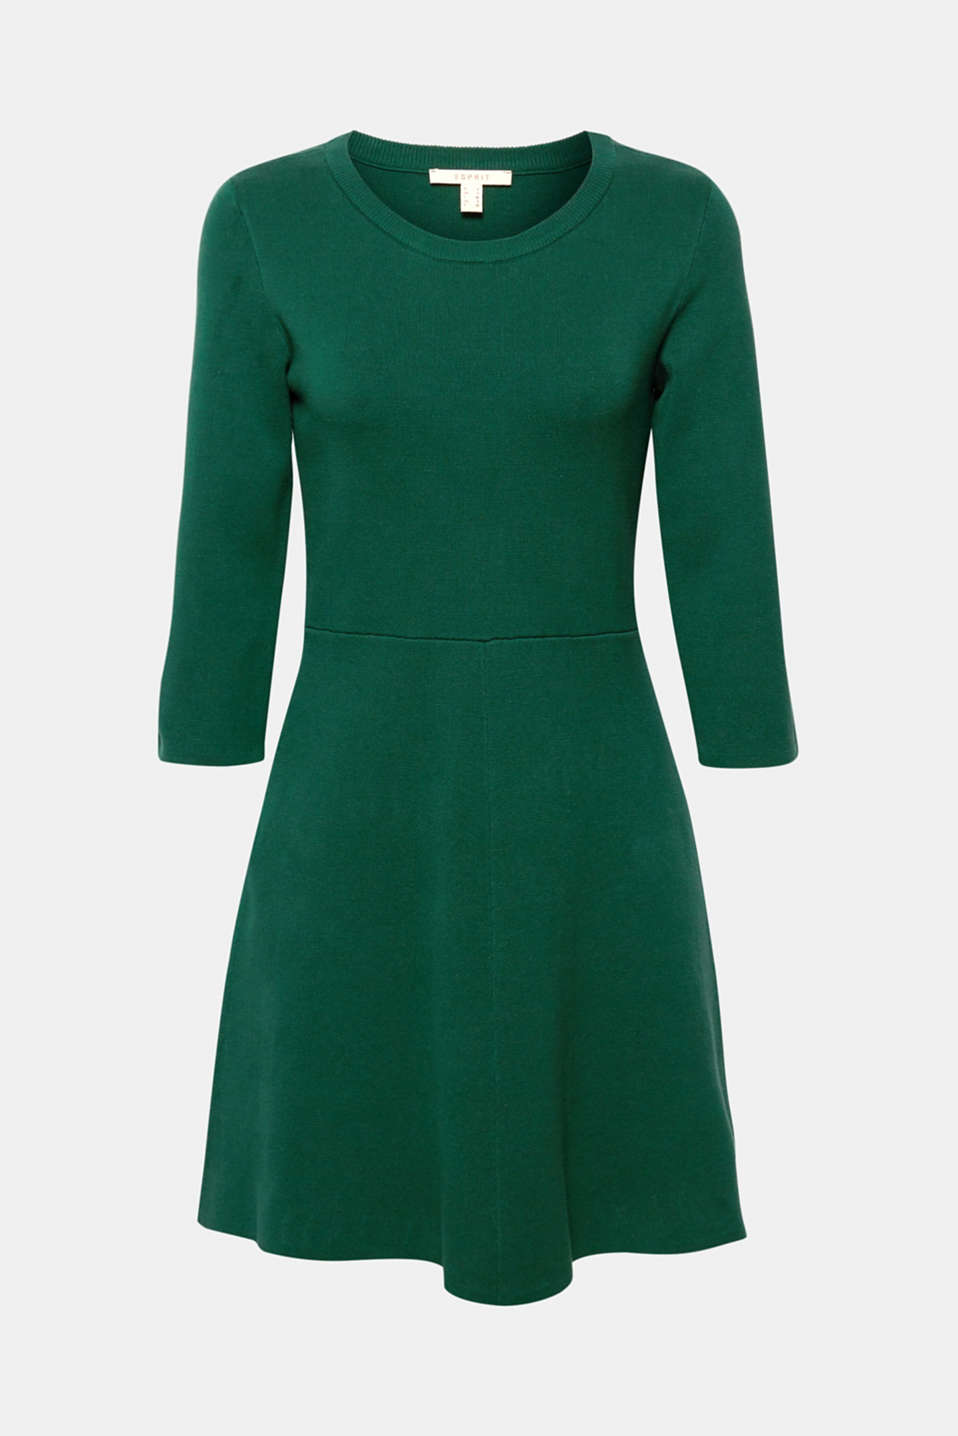 Dresses flat knitted, BOTTLE GREEN, detail image number 6